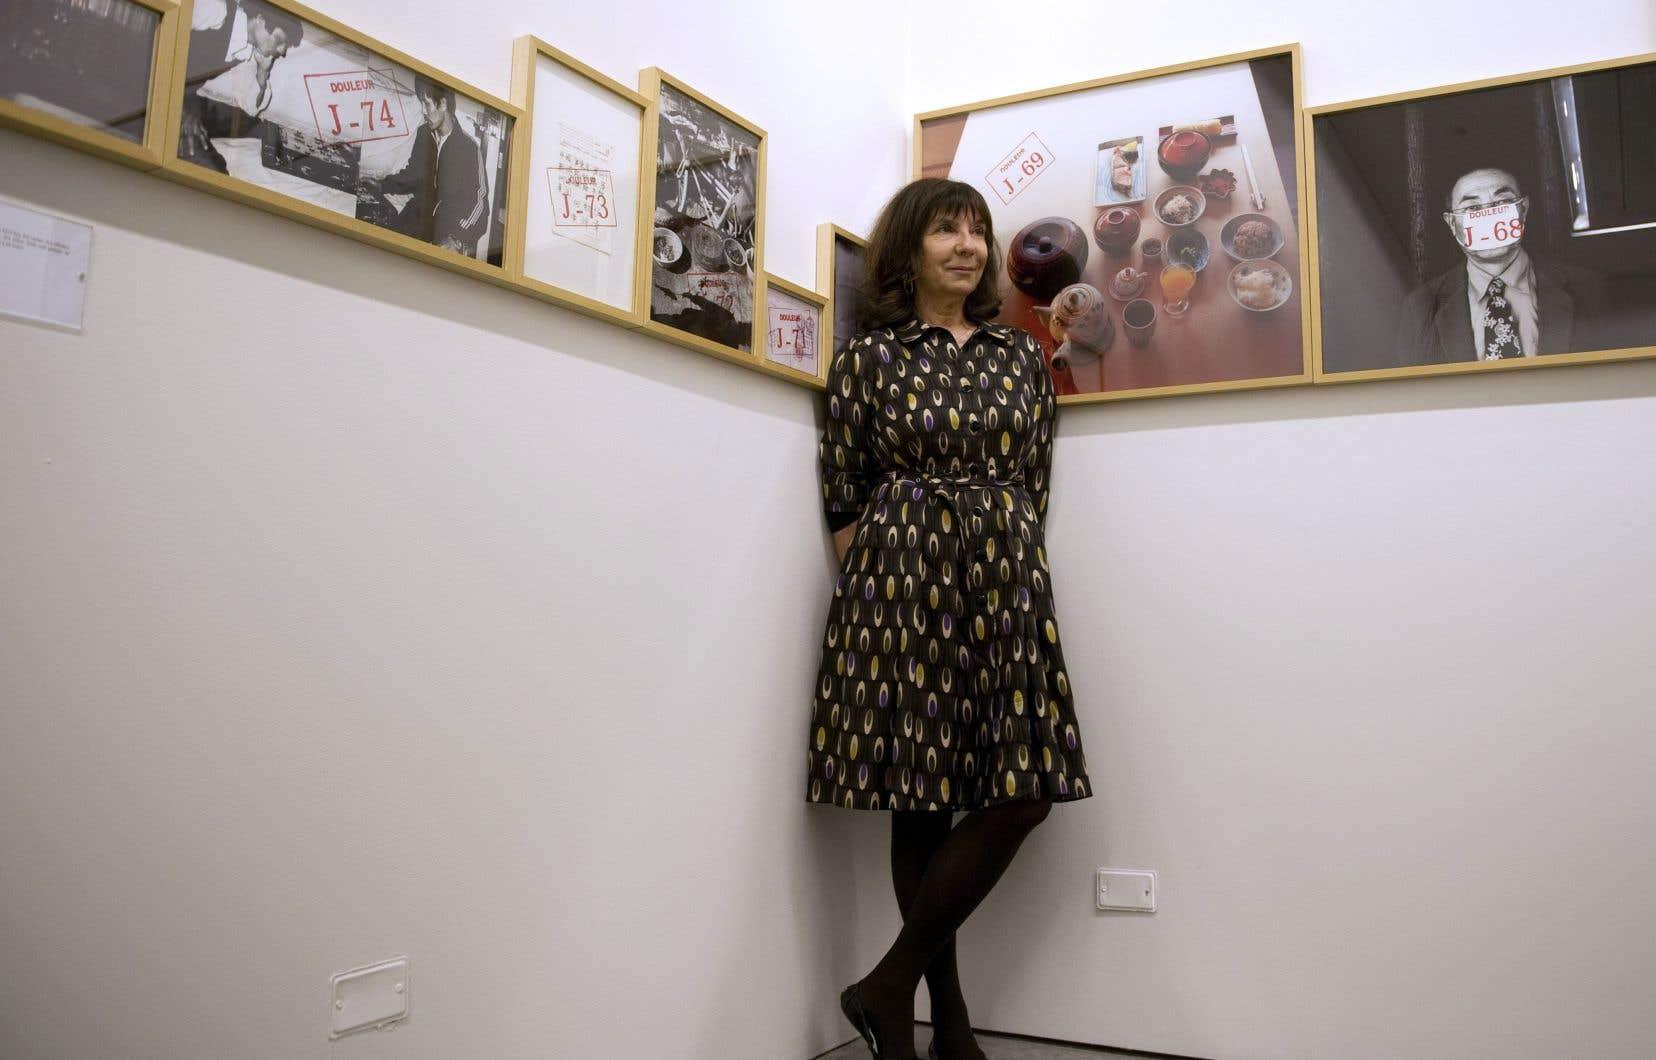 L'artiste Sophie Calle au Musée d'art moderne de Medellín, en Colombie, en 2012